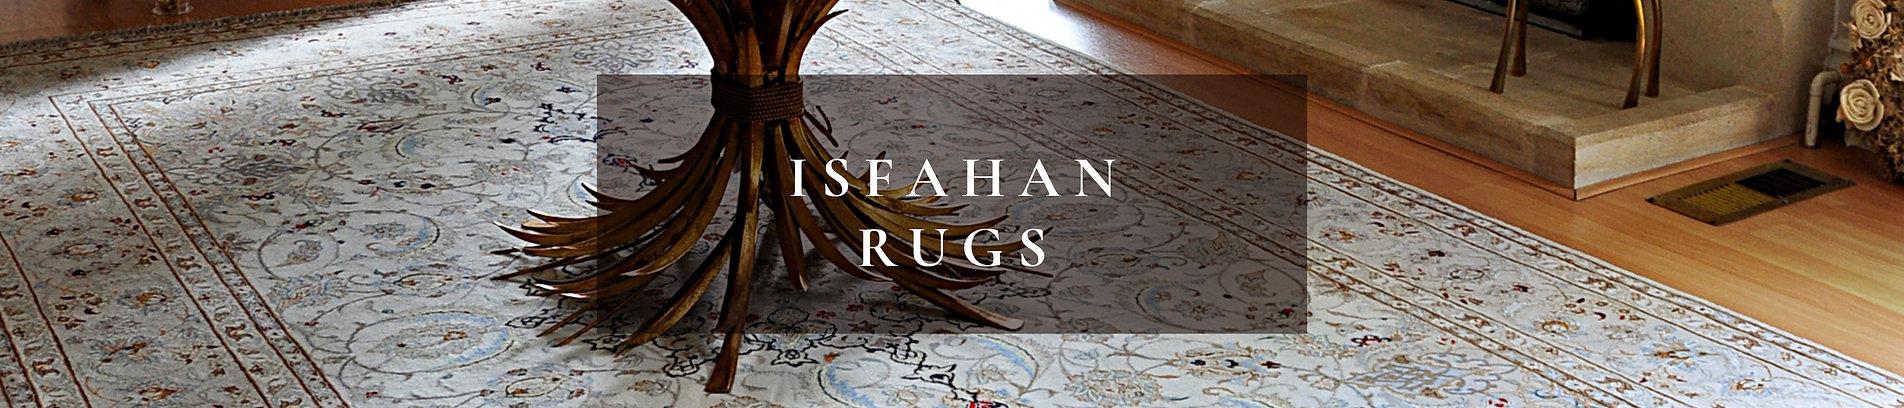 Isfahan Rugs.jpg